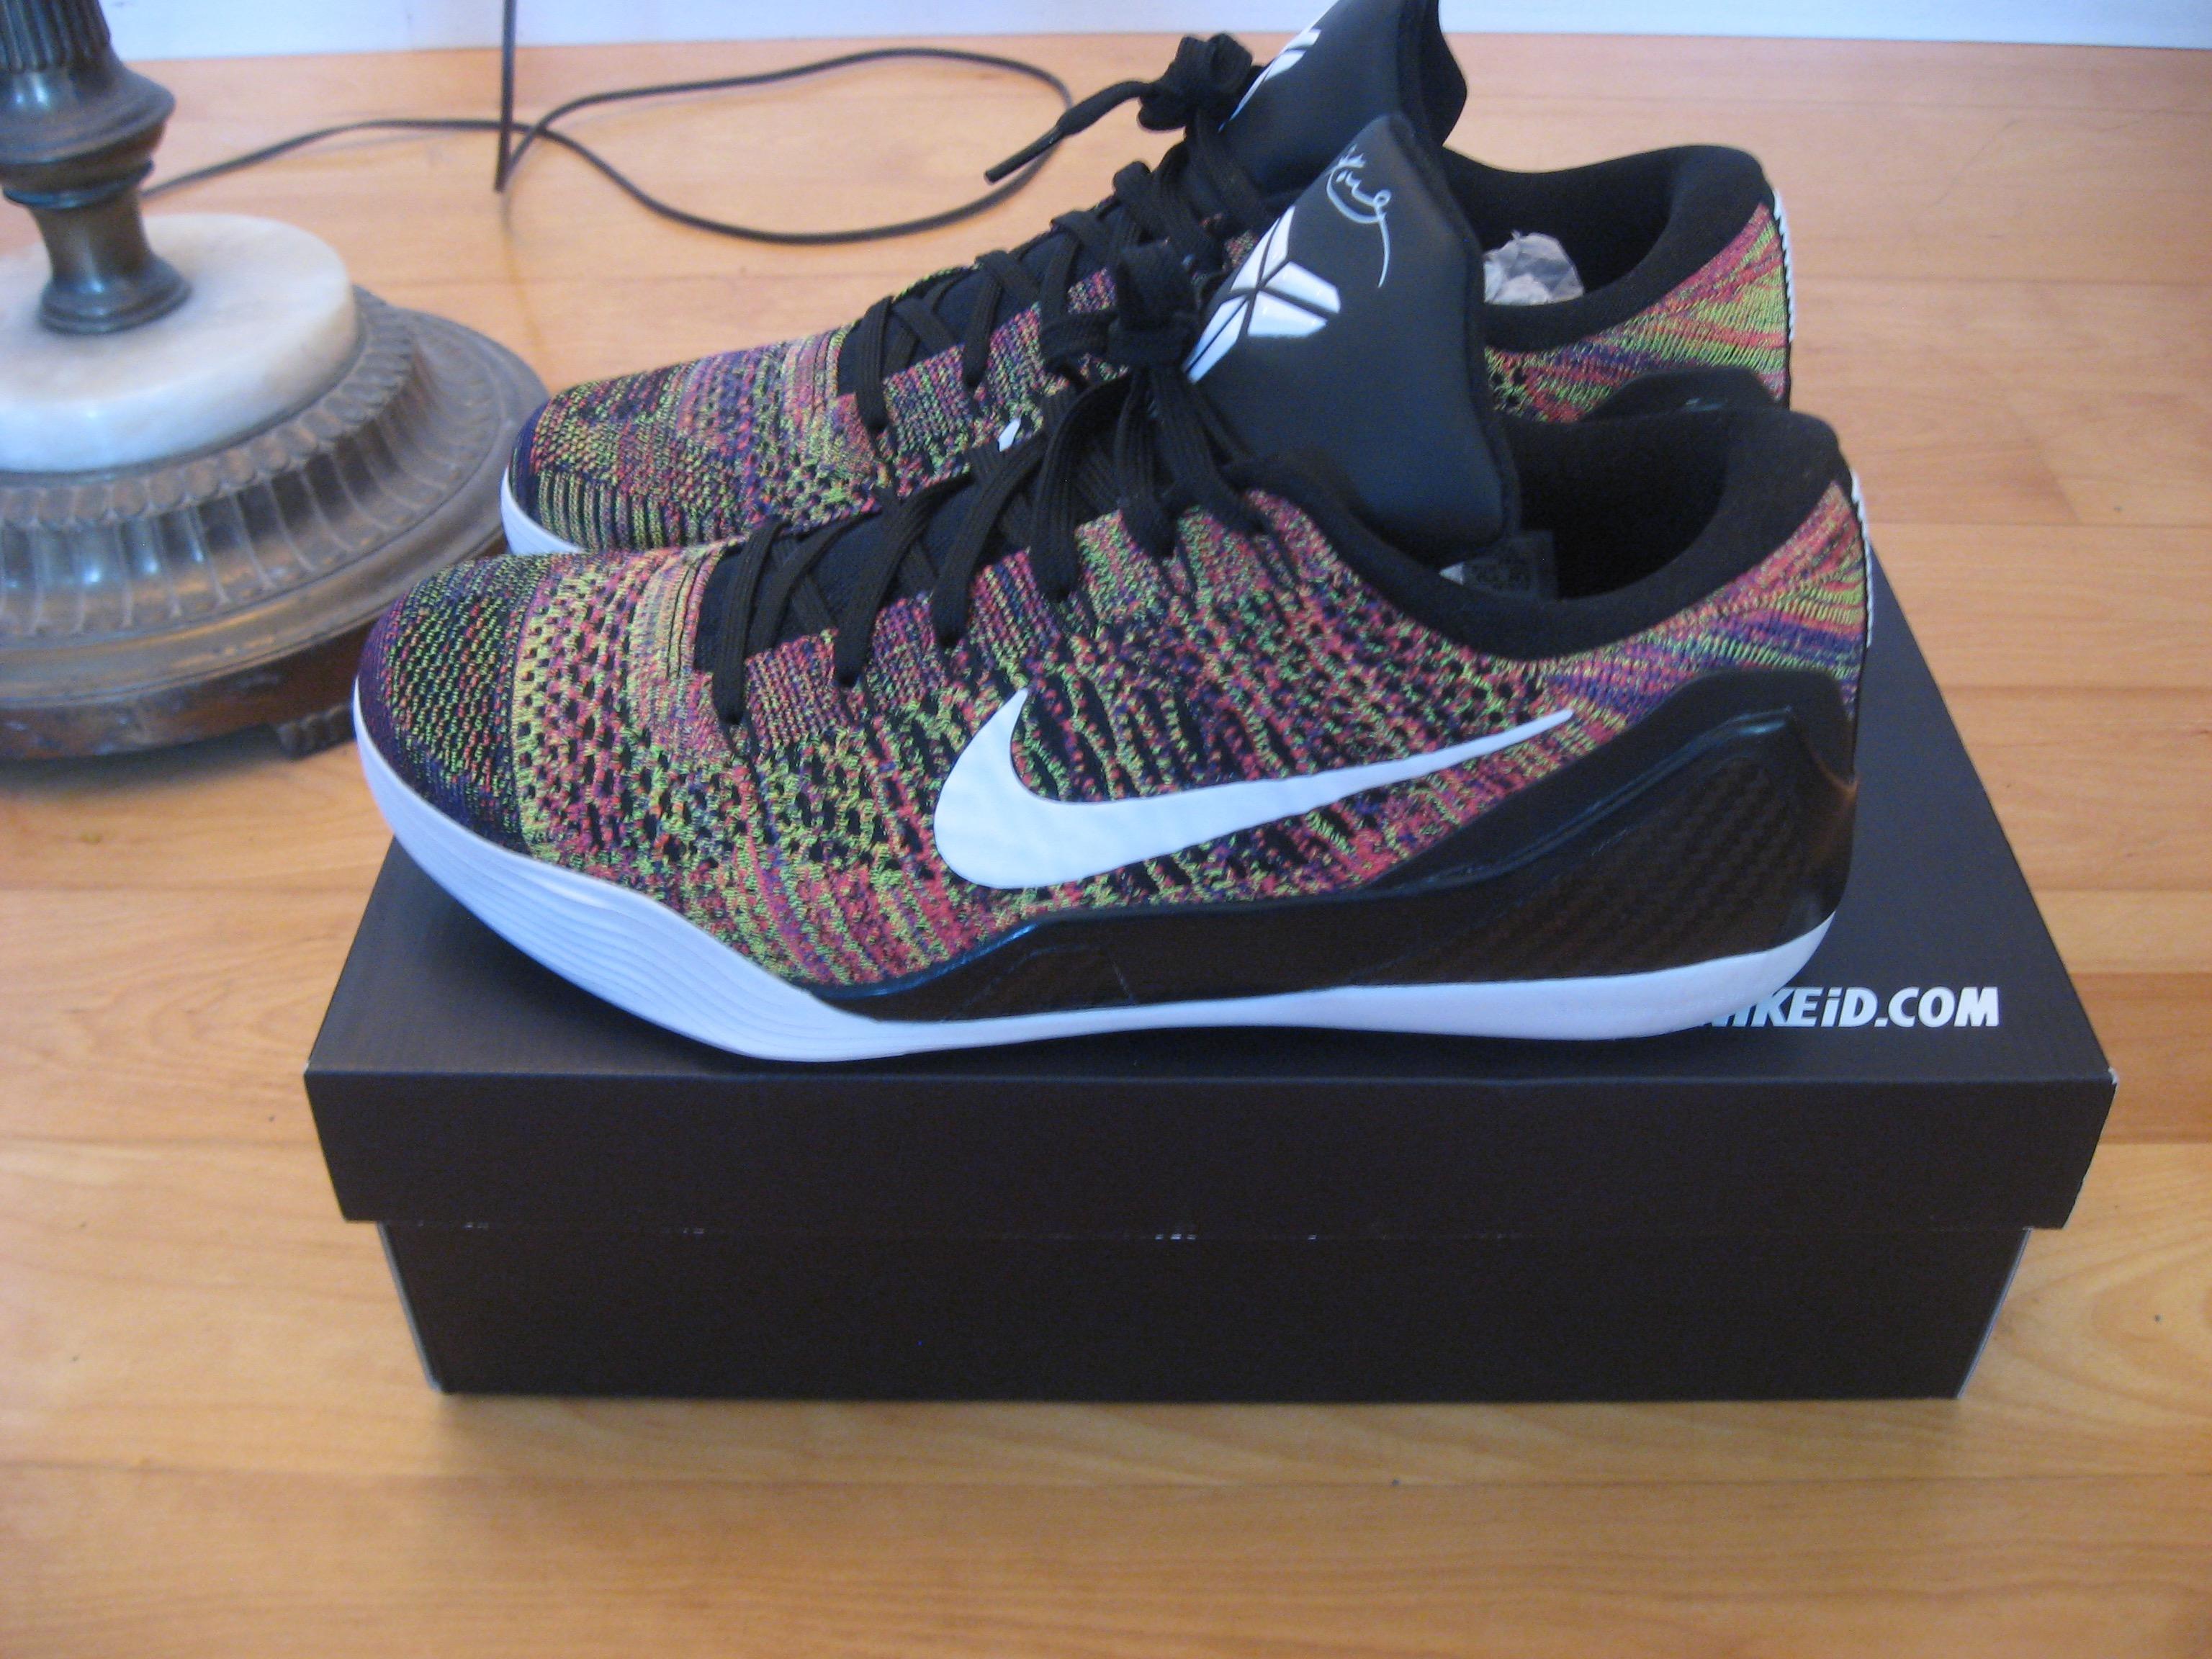 differently 784ed 8799c Nike. VNDS Sz.11.5 Nike Kobe IX 9 ID Flyknit Elite Low Multicolor Multi  Color